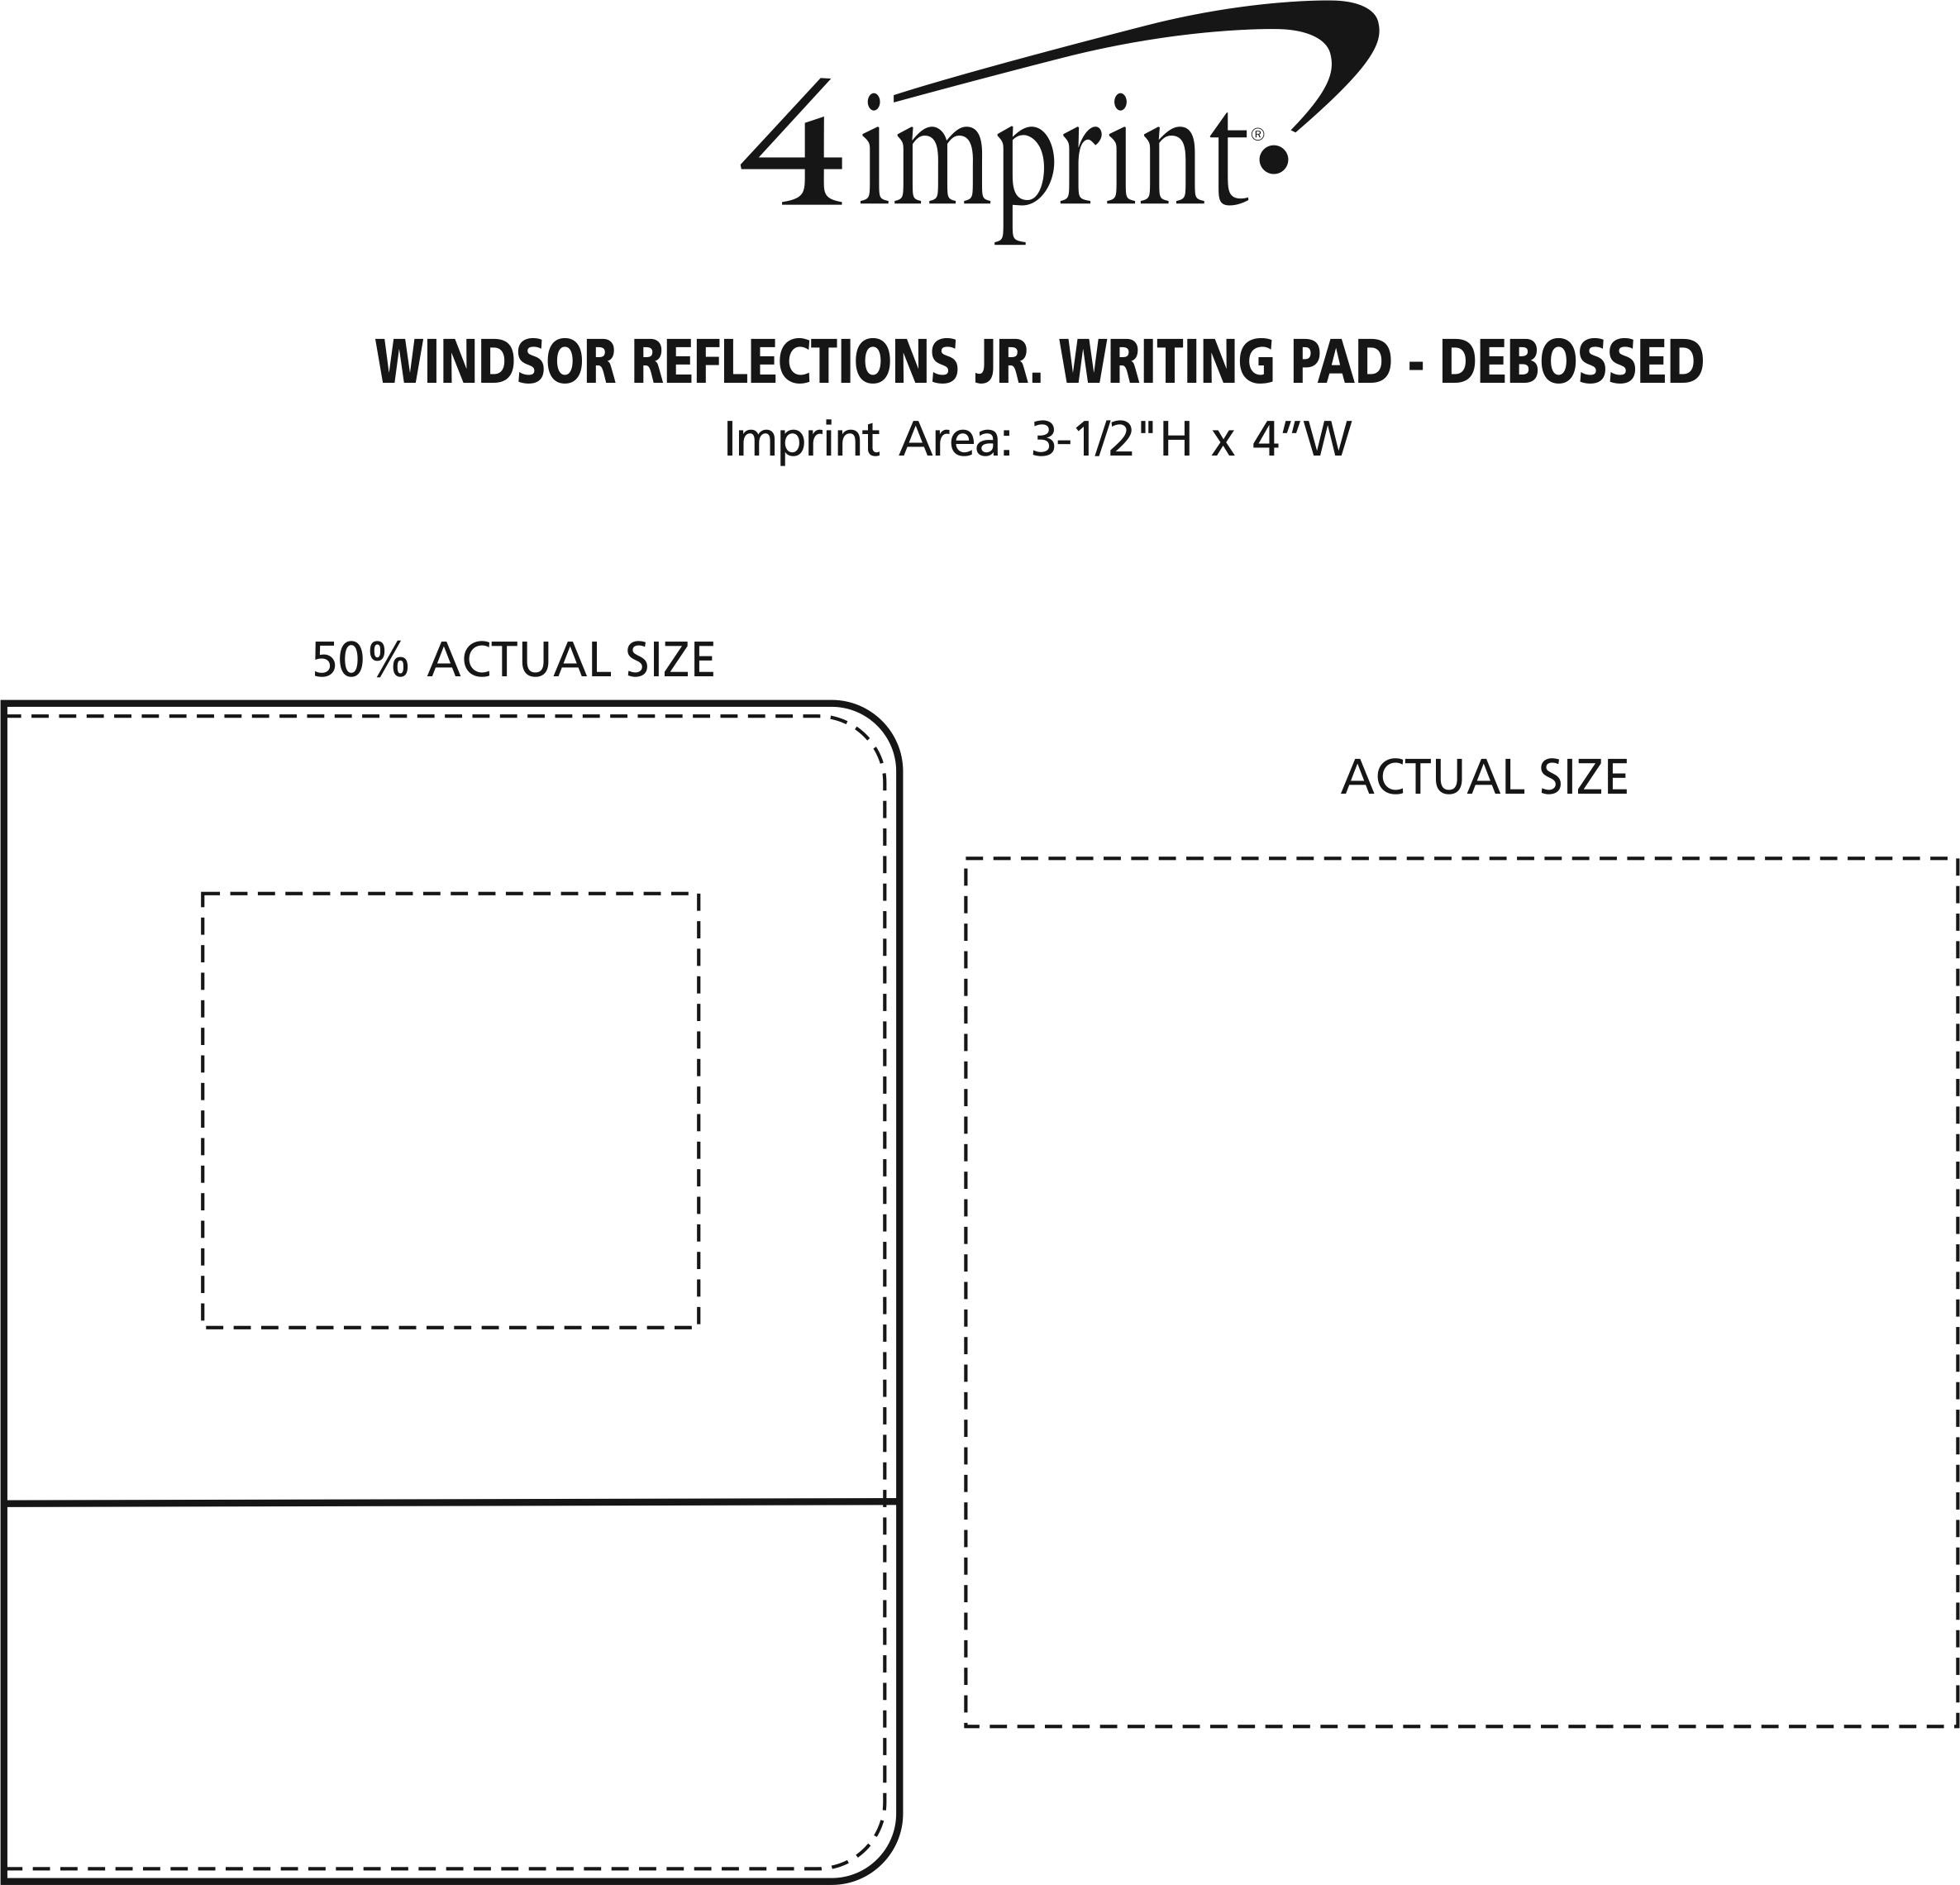 Imprint Area of Windsor Reflections Jr. Writing Pad - Debossed